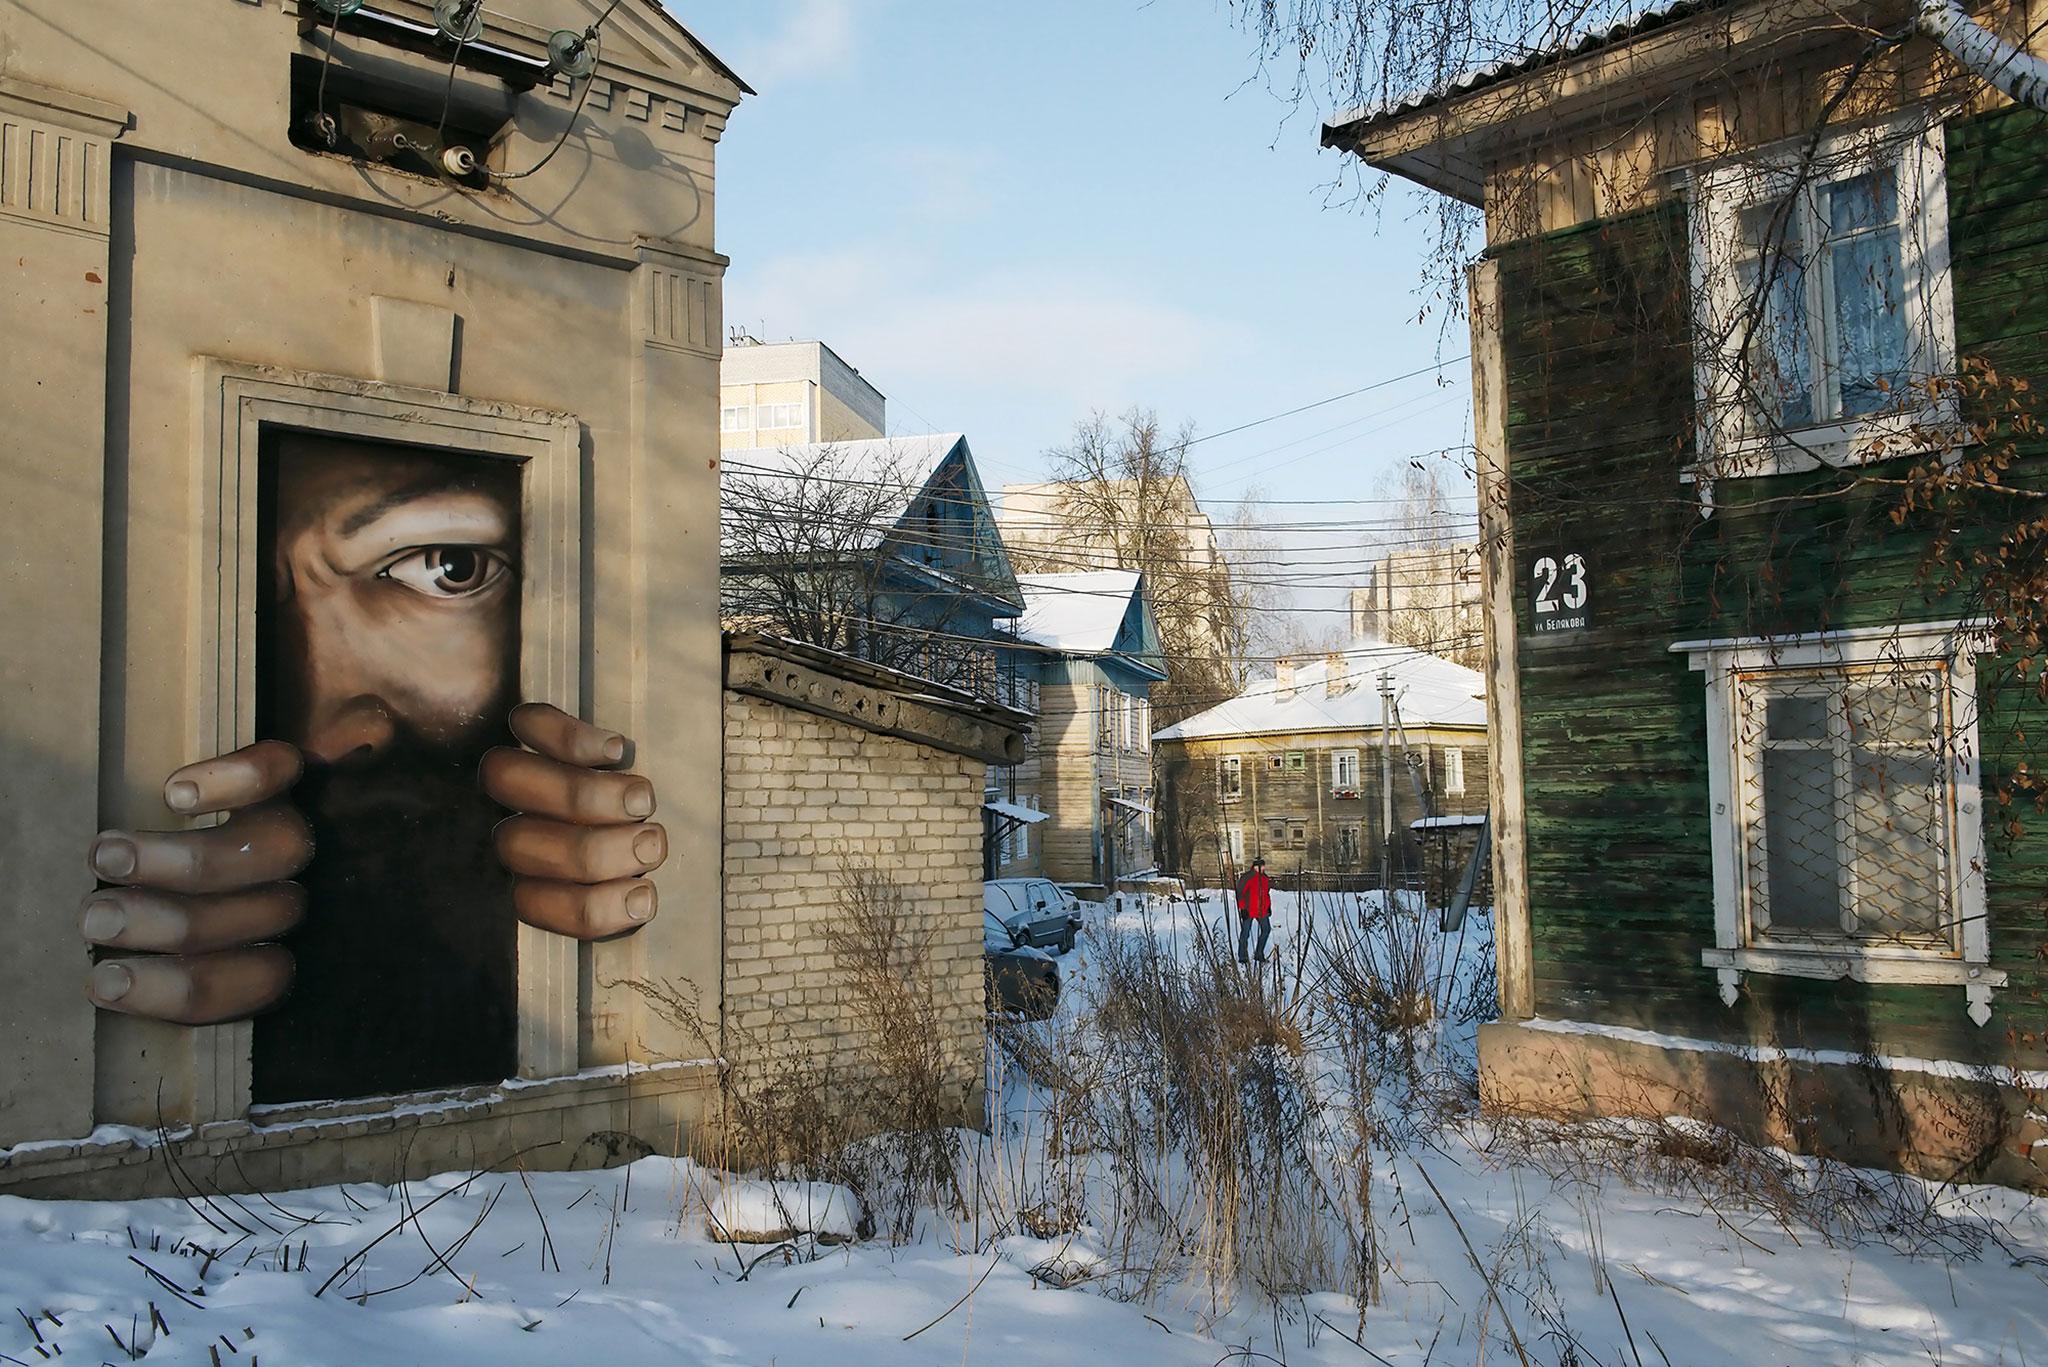 Nikita Nomerz graffiti arte de rua russo faces vida (18)